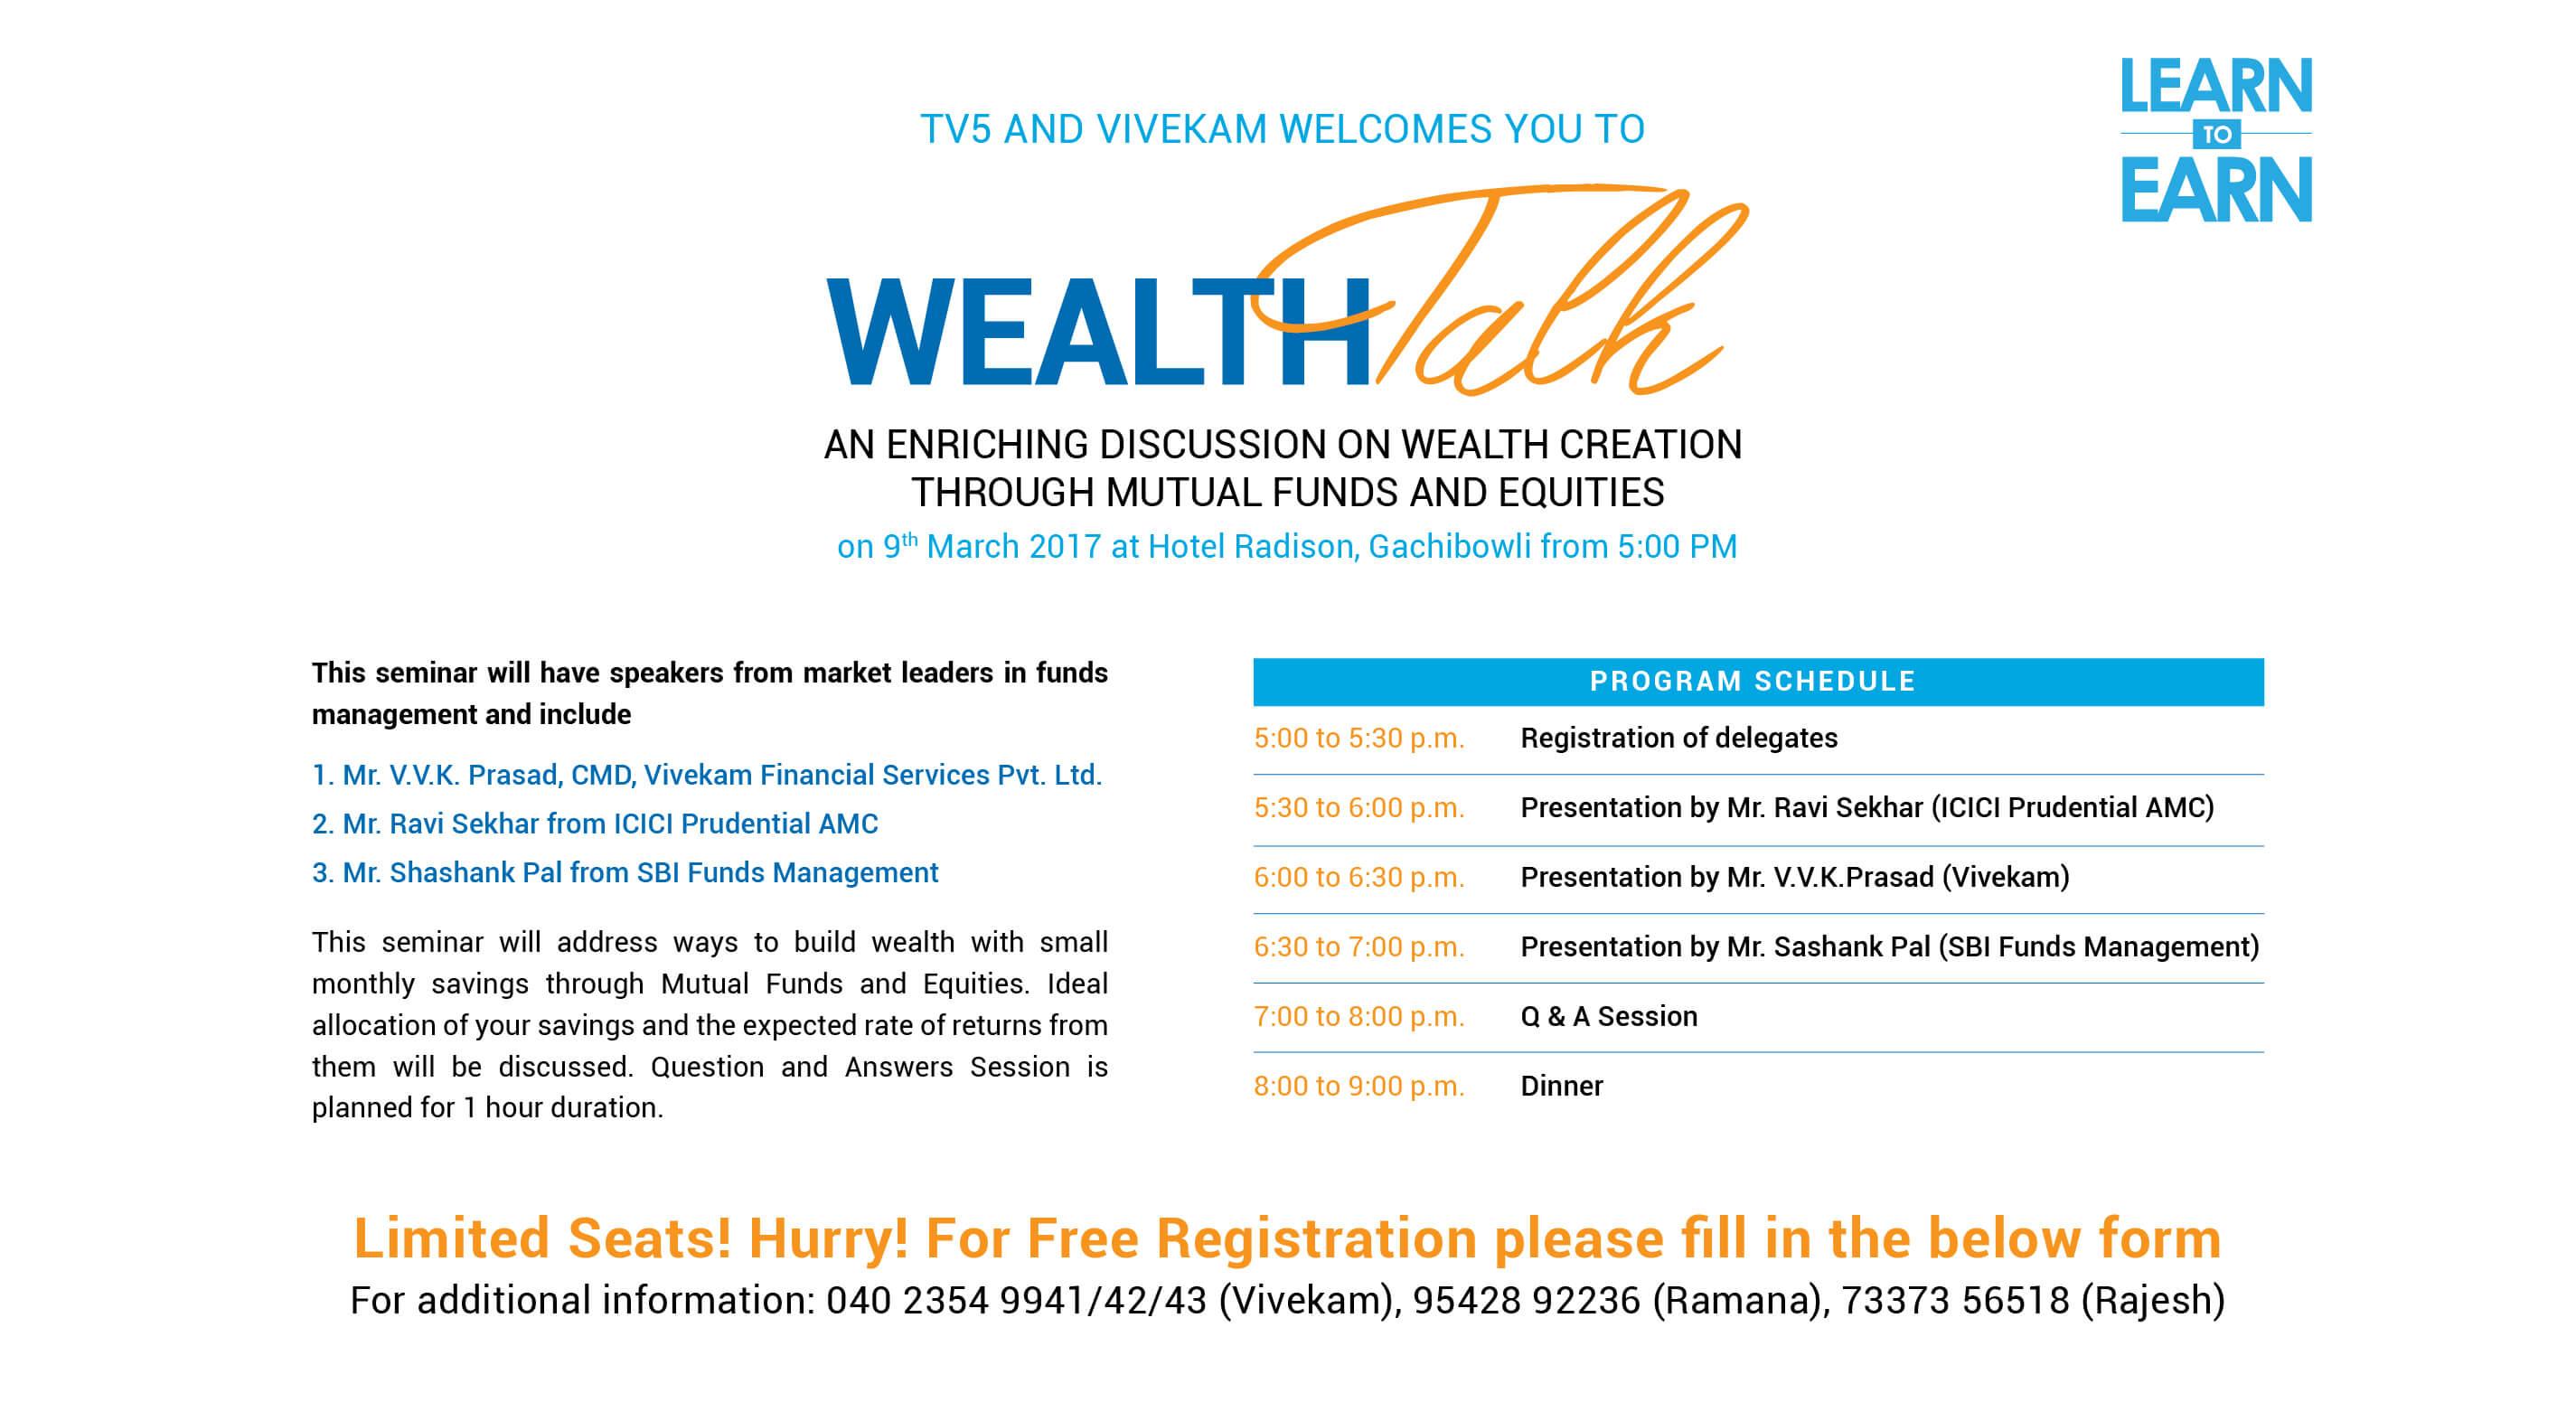 Wealth Talk on 09th March 2017